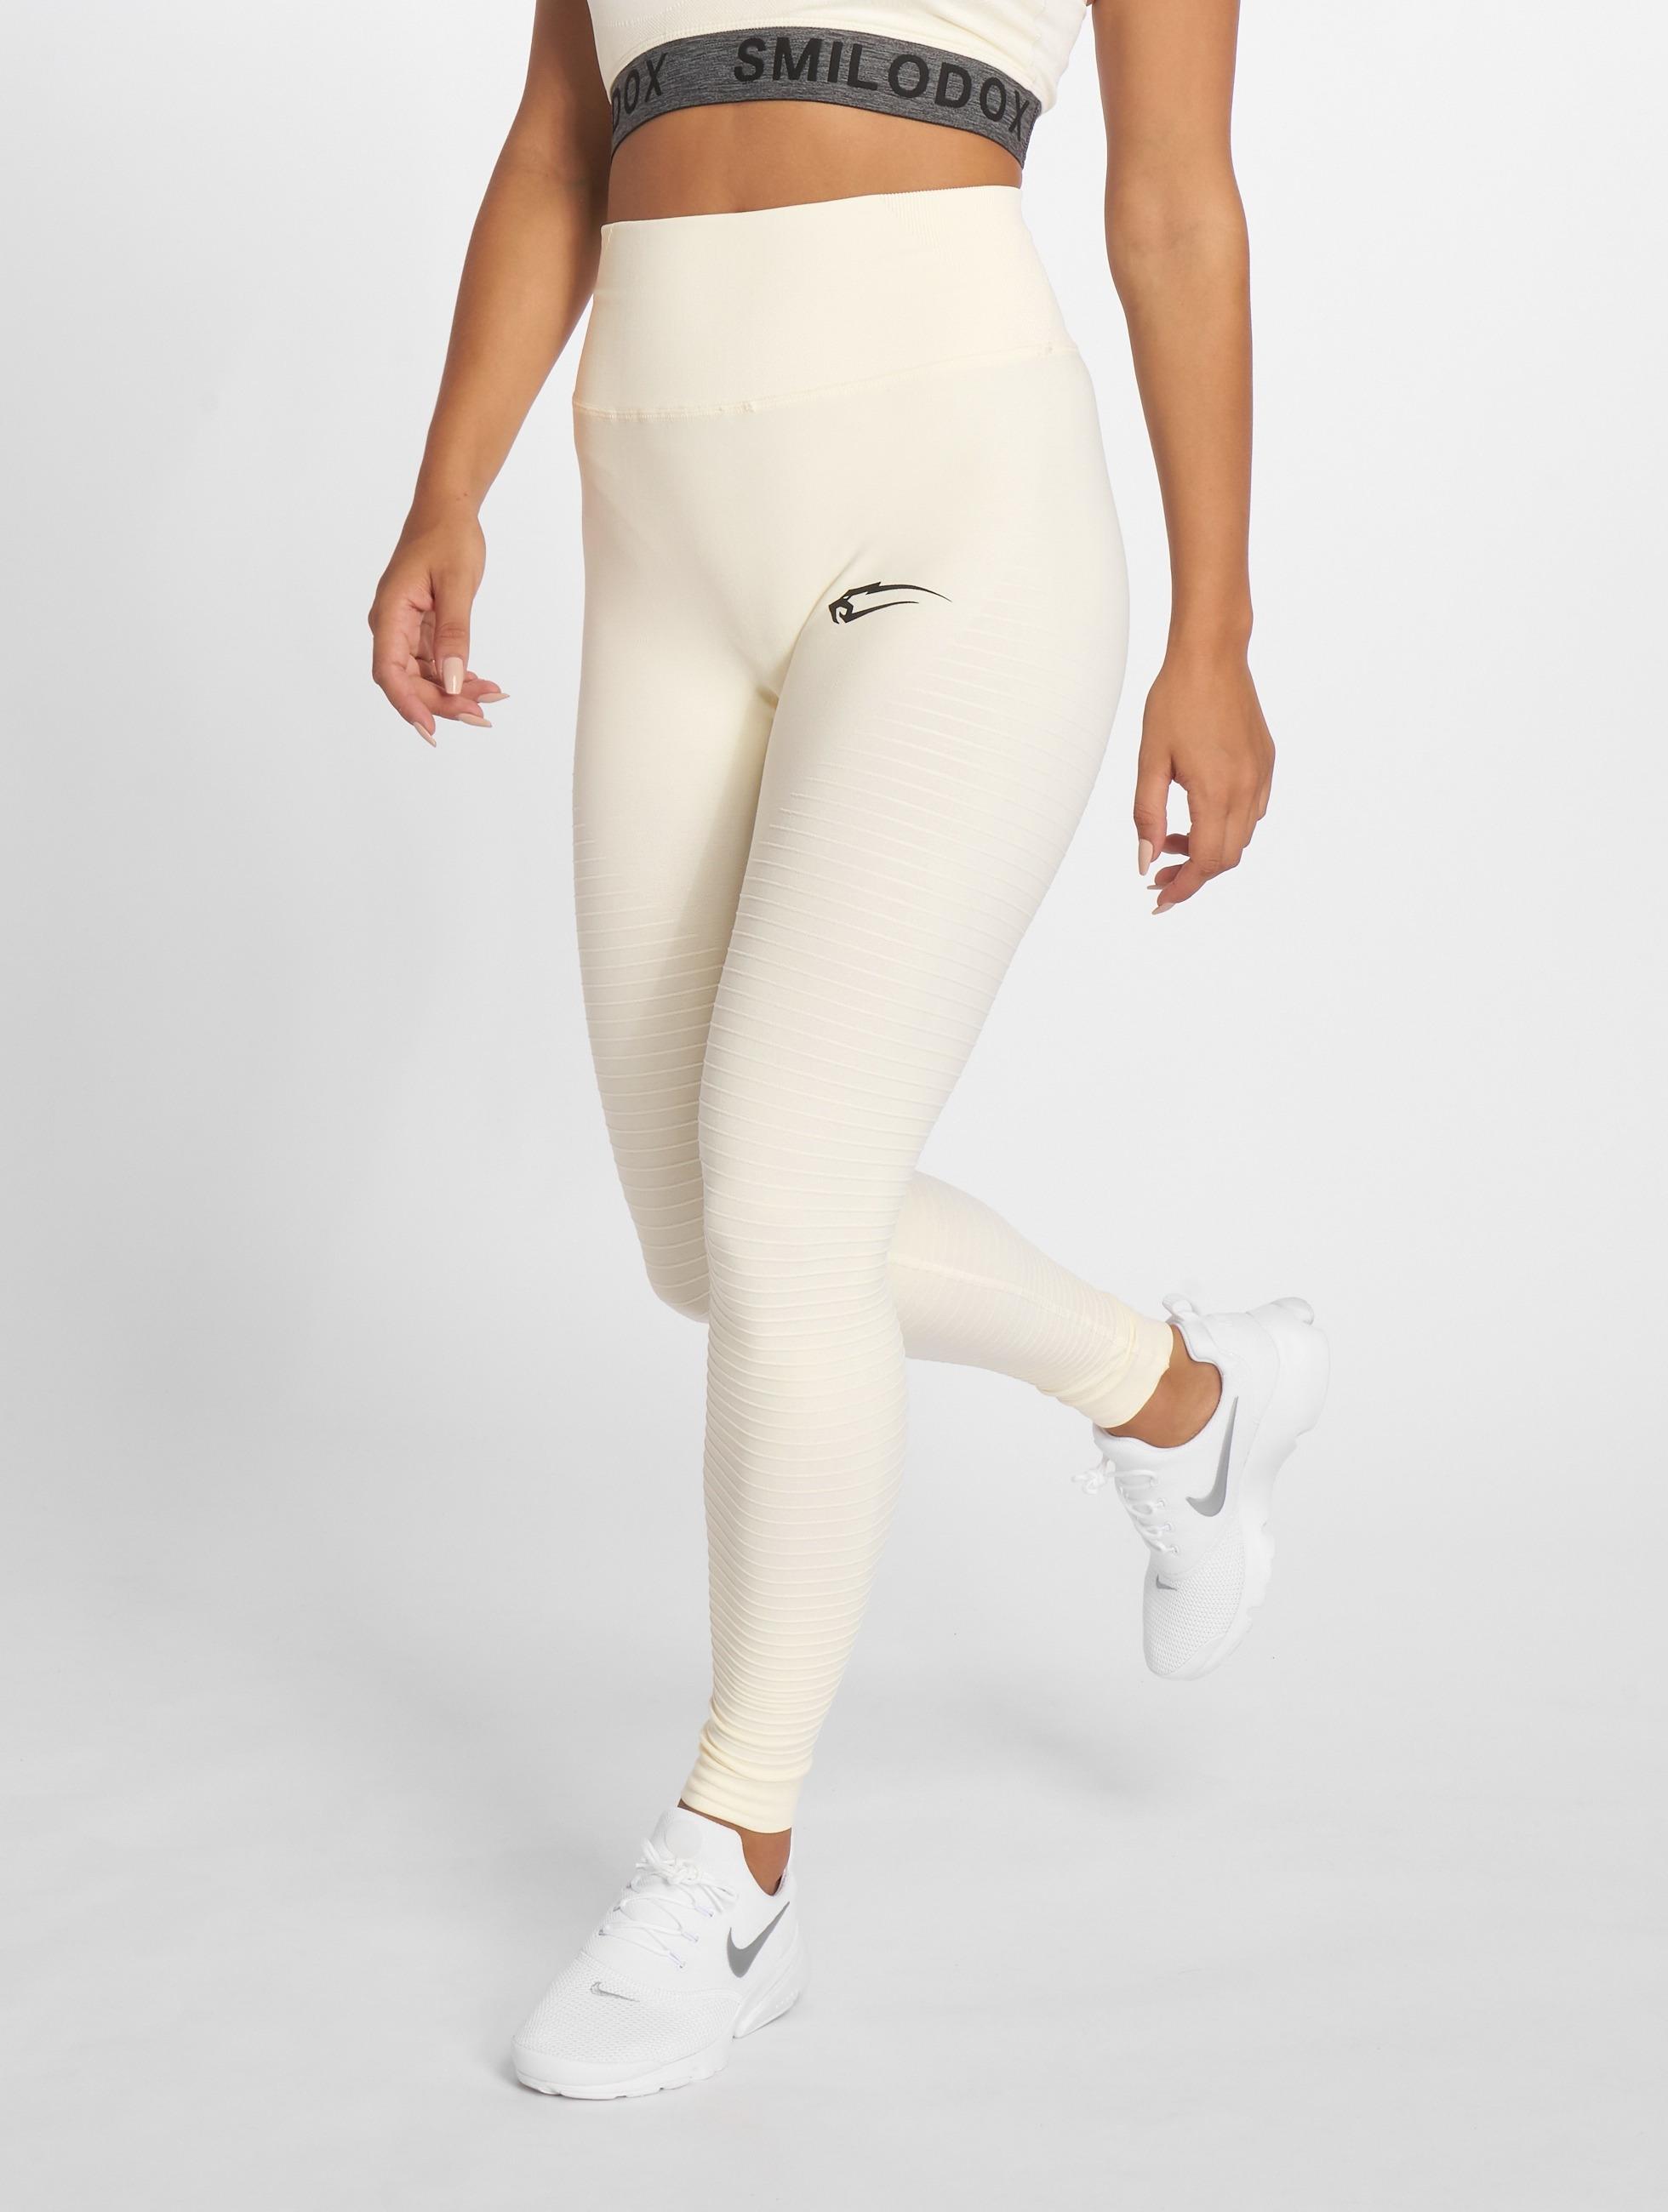 Smilodox | Yura High Waist beige Femme Leggings de sport